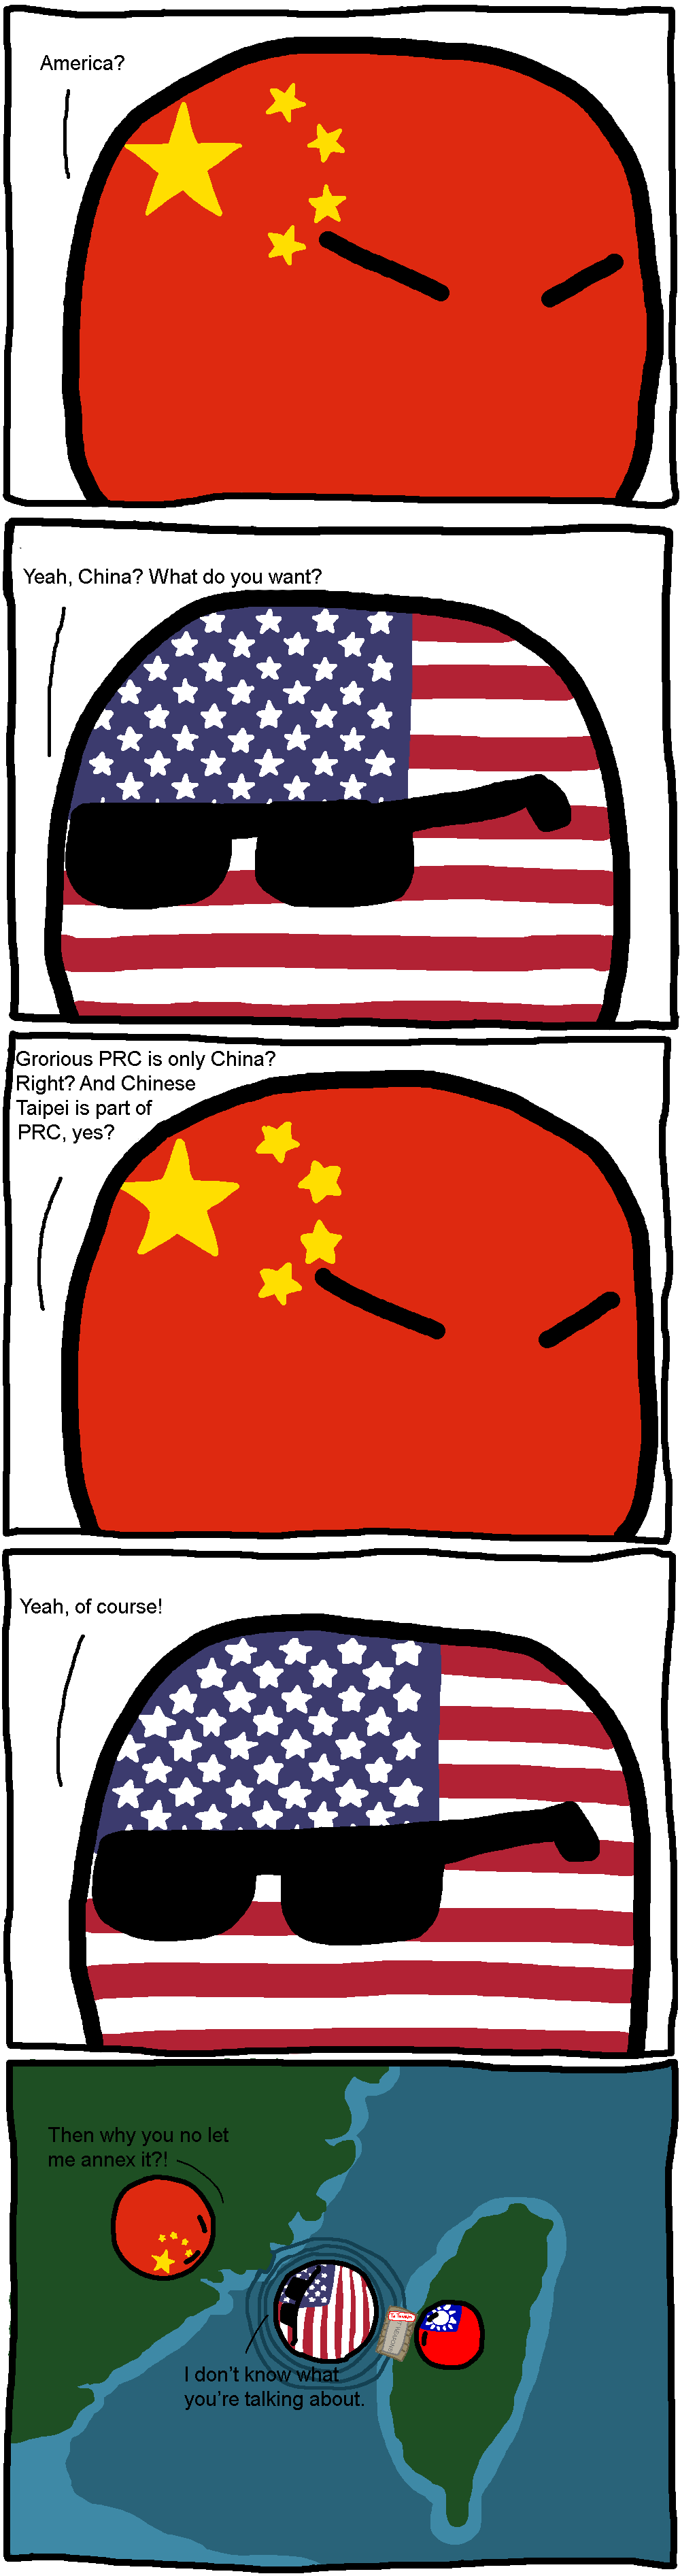 People's Republic of China, Only China! : polandball.